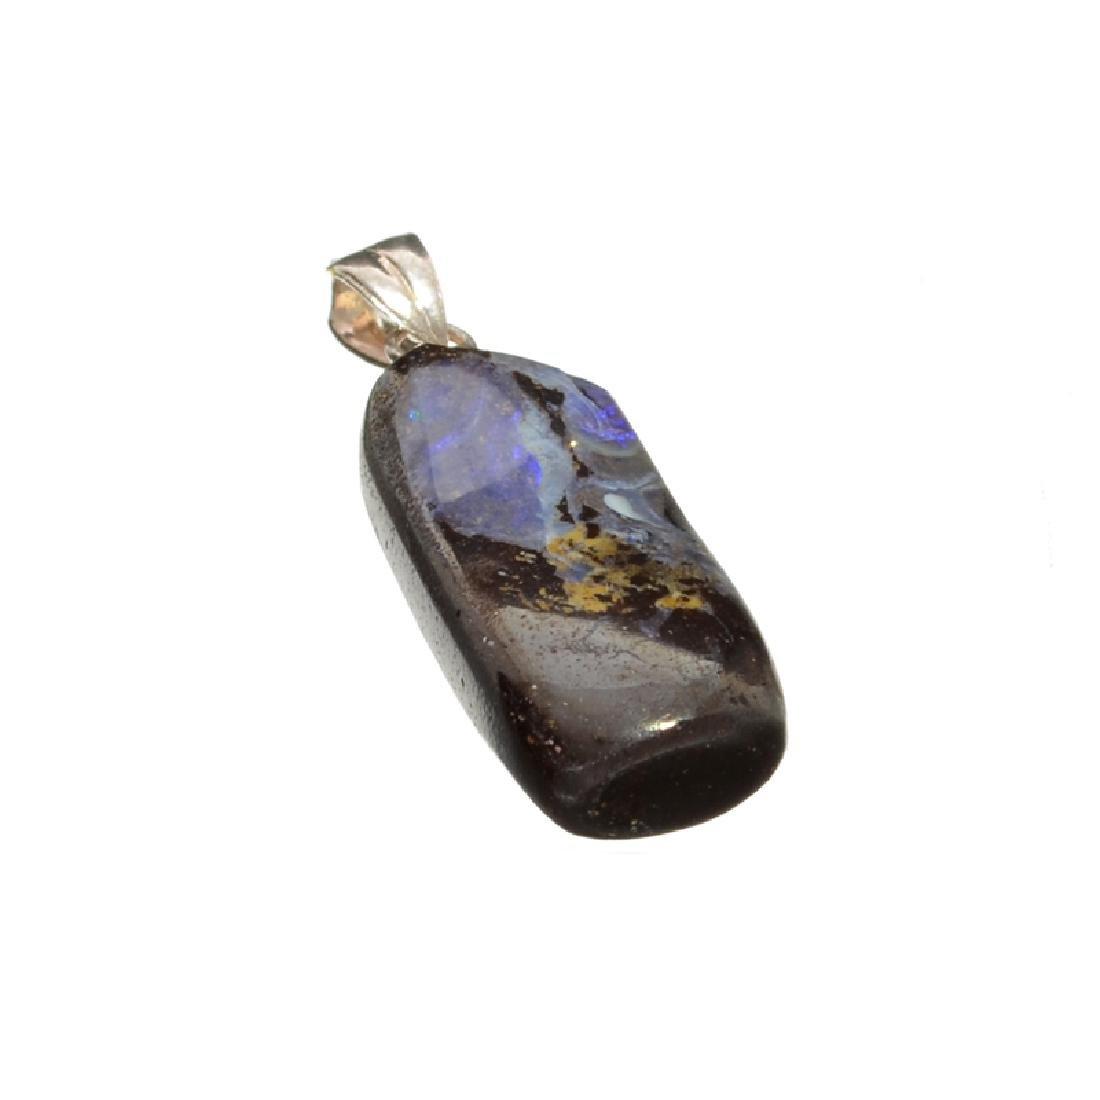 12.40CT Boulder Opal Sterling Silver Pendant